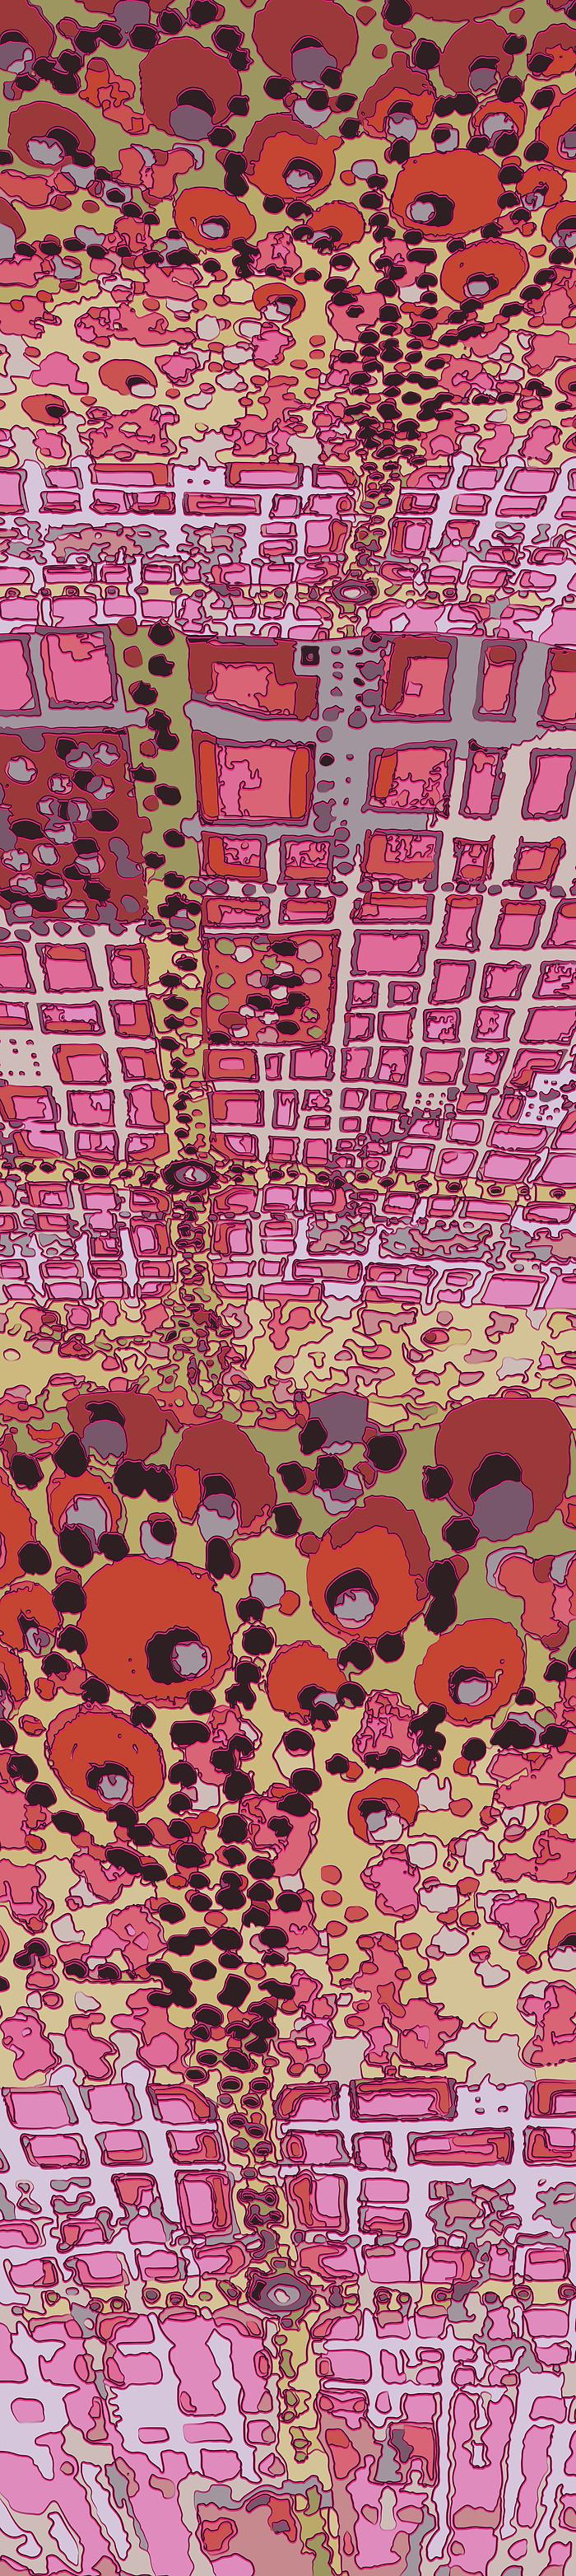 pink city - yf